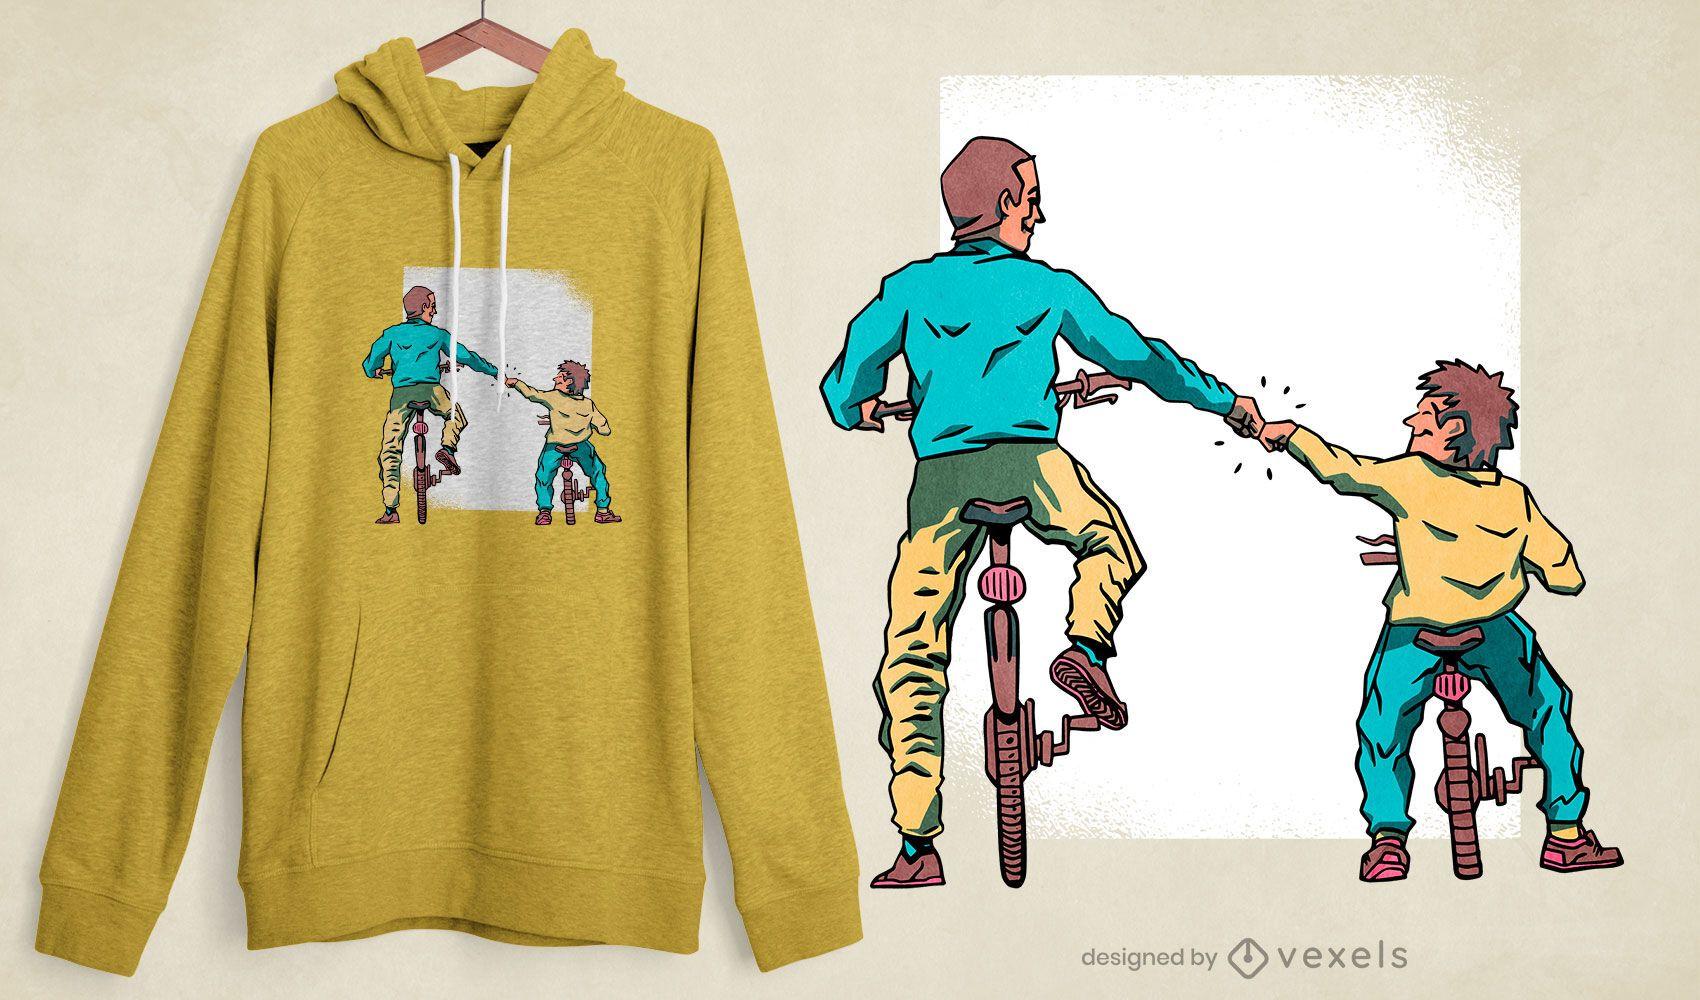 Diseño de camiseta de bicicletas padre e hijo.